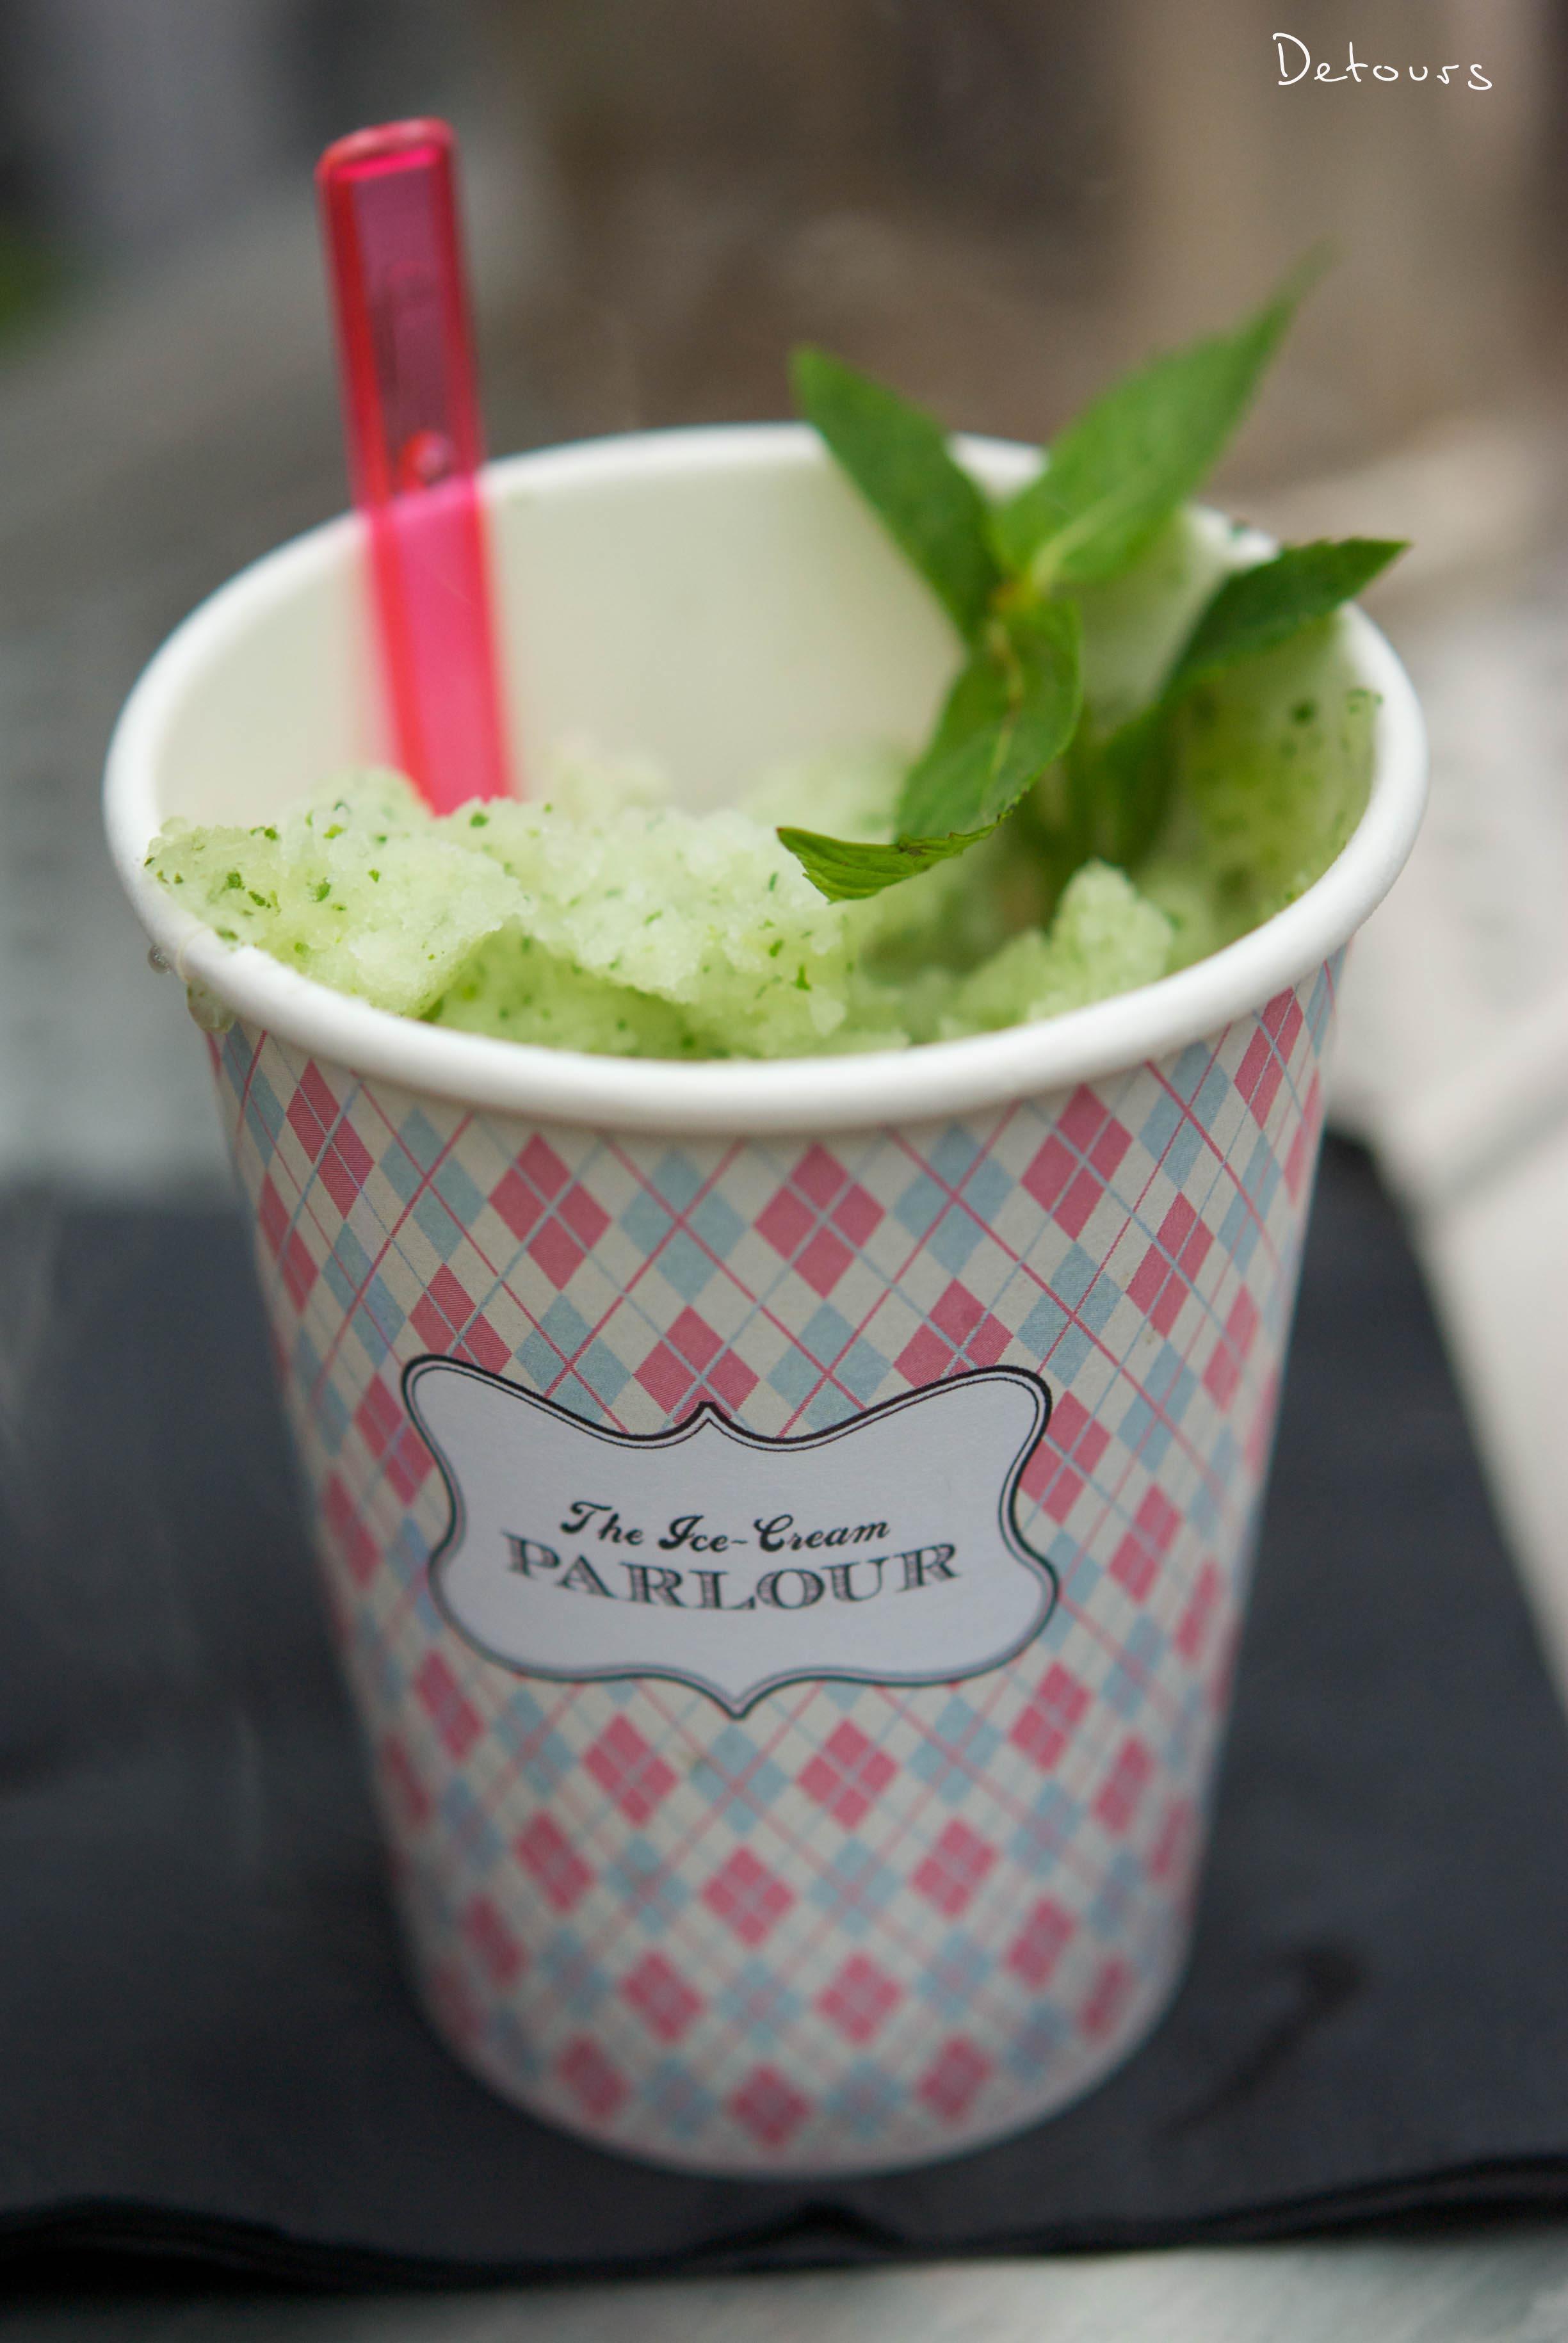 Sydney Zeta Bar - Mojito ice cream